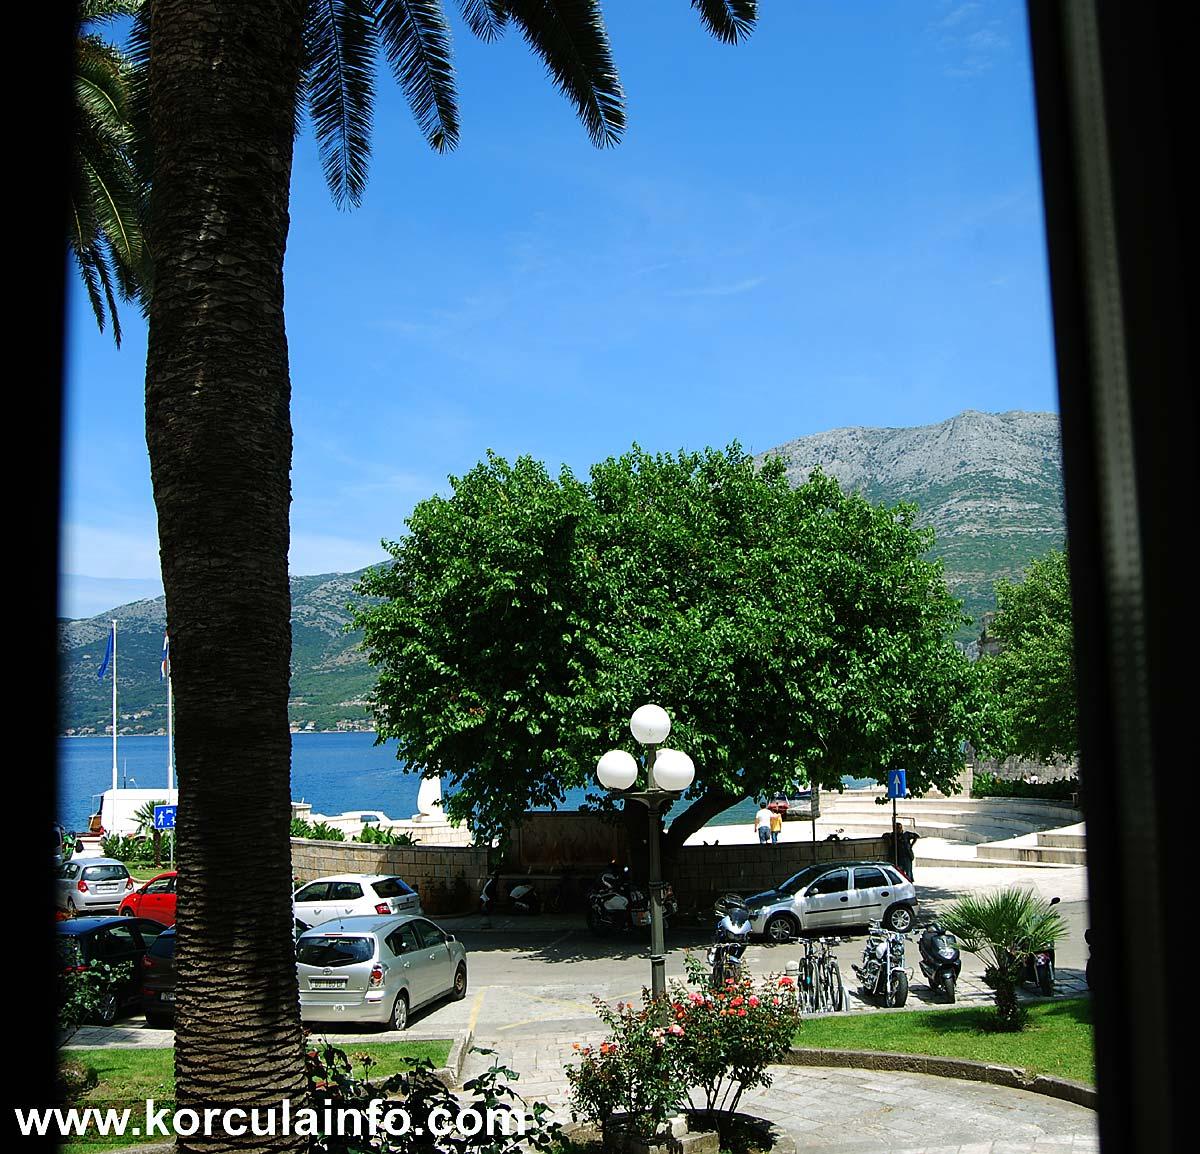 Sea Views from Hotel Fabris - Korcula